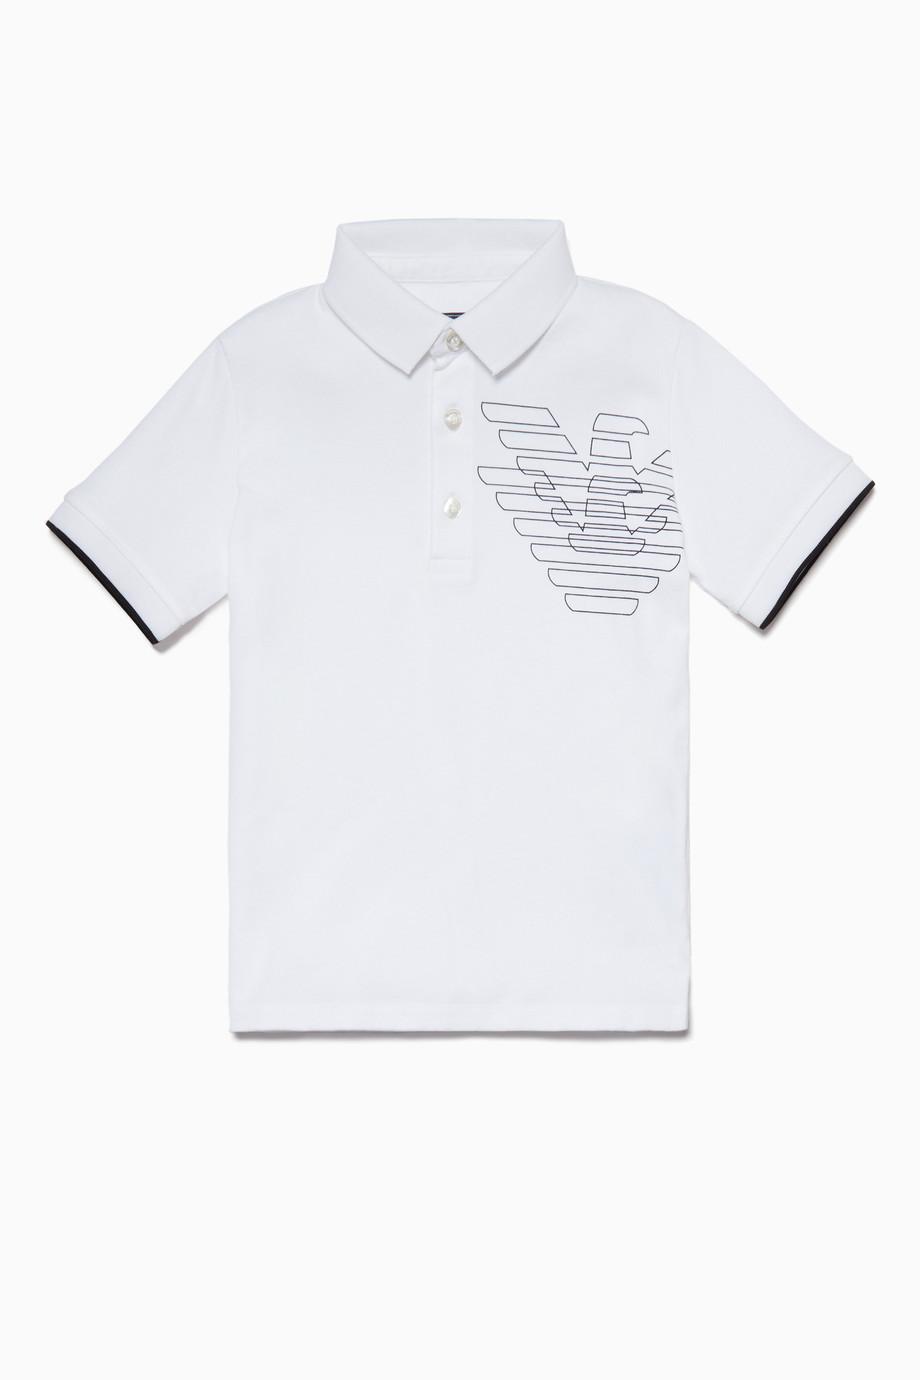 646c9138b69dd تسوق تي شيرت بولو بطبعة شعار الماركة أبيض Emporio Armani ابيض ...